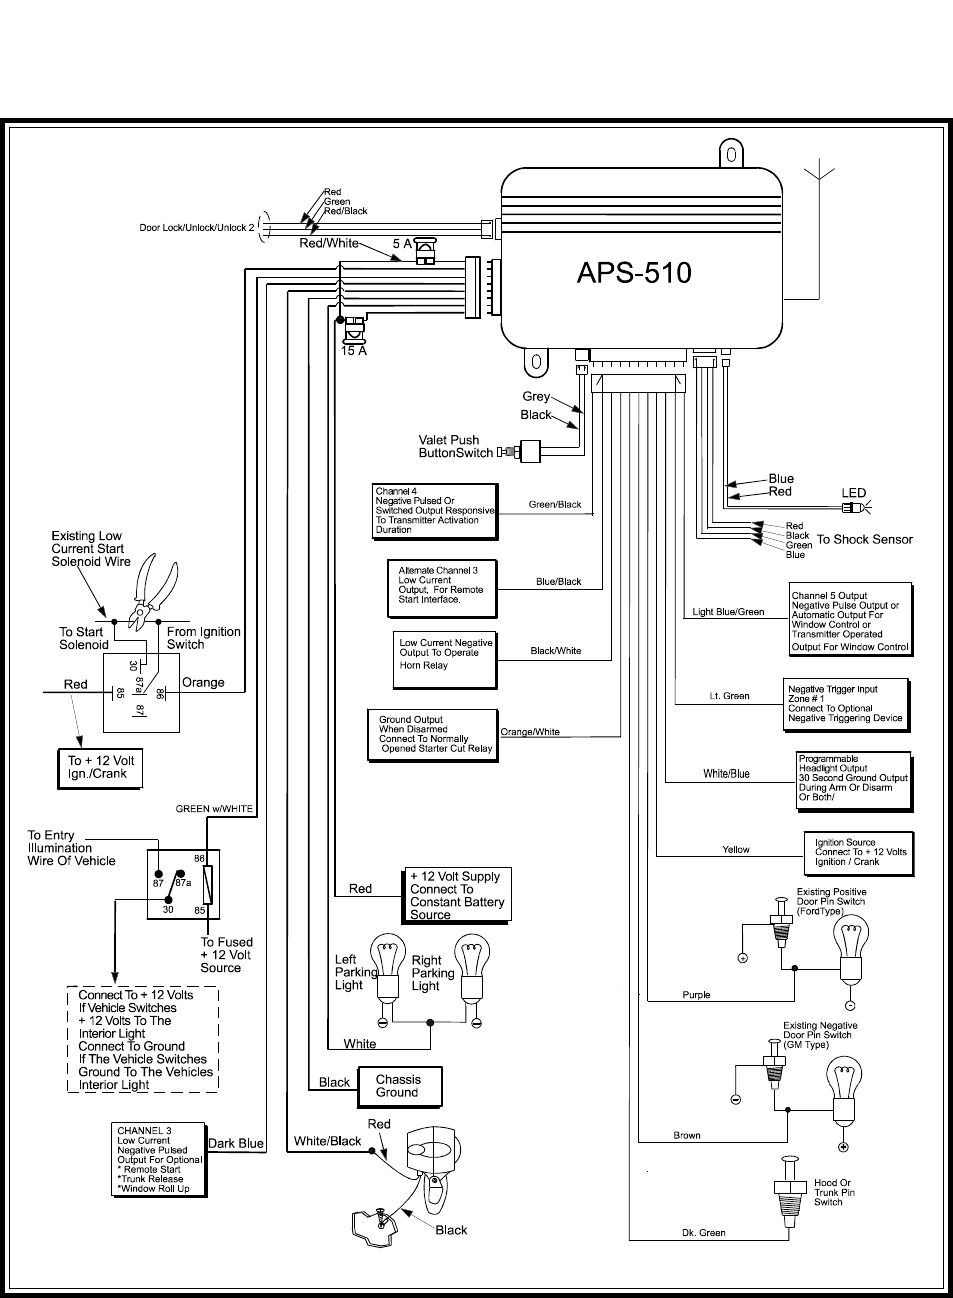 Download Here: Wiring Diagram Of Car Alarm | ePANEL Digital ... on